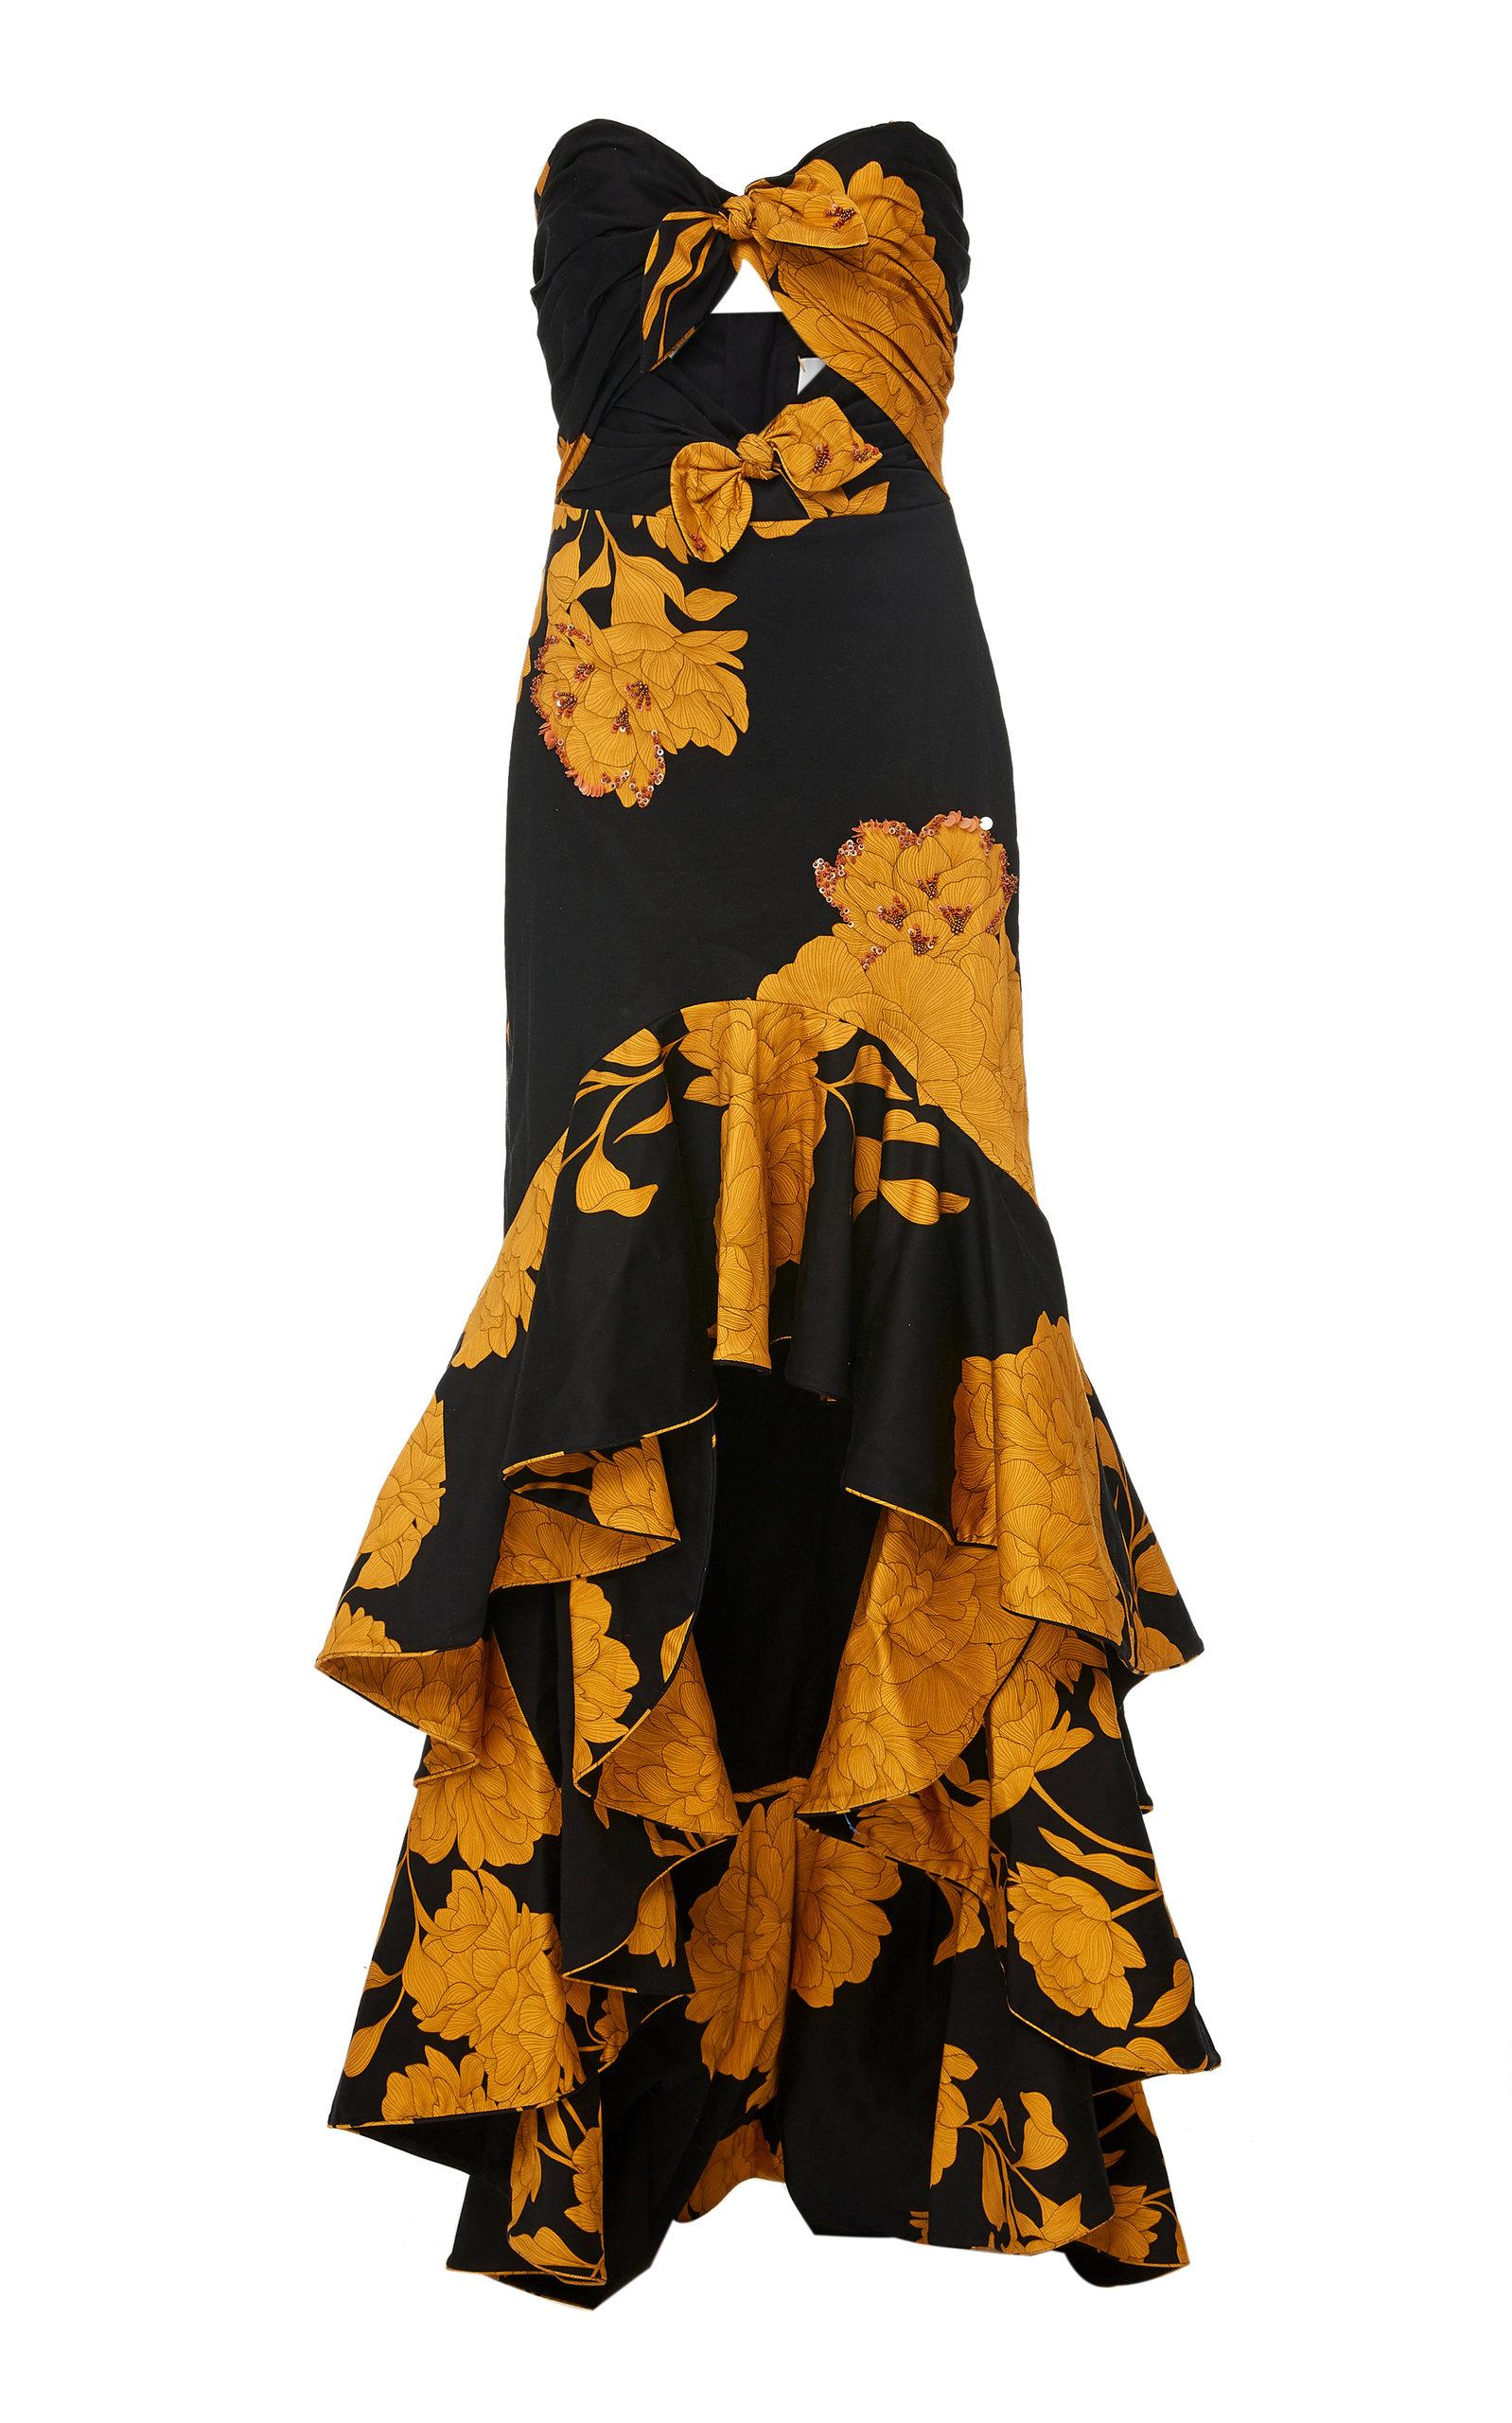 Buy Johanna Ortiz Exclusive Path Of Rose Ruffled Cotton-Blend Dress online, shop Johanna Ortiz at the best price